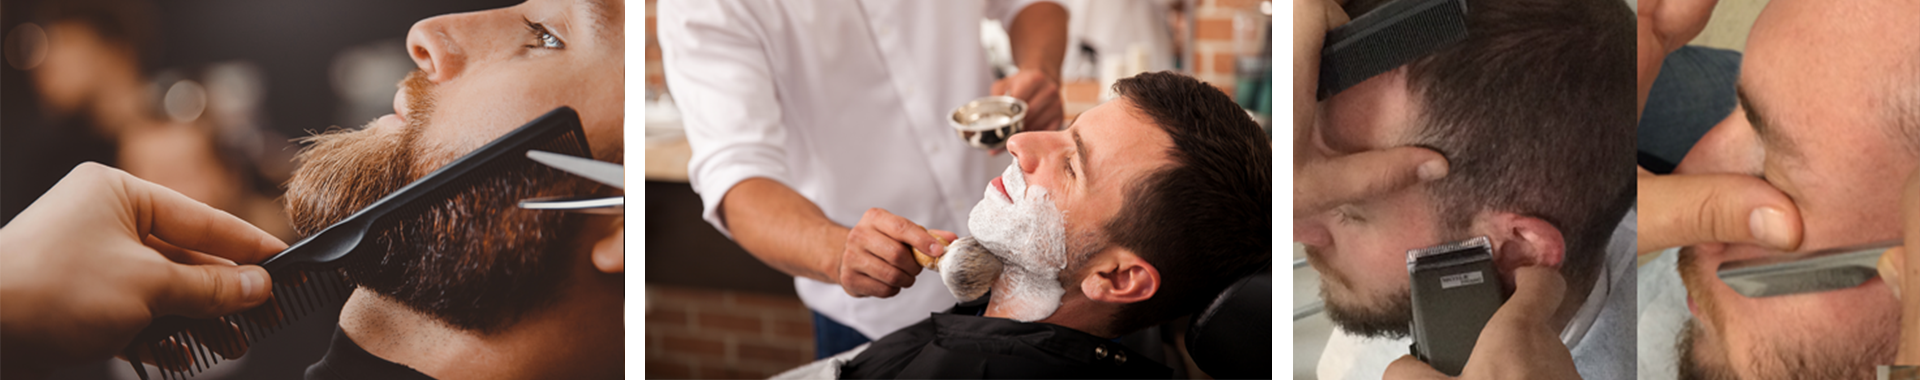 barbier-formation